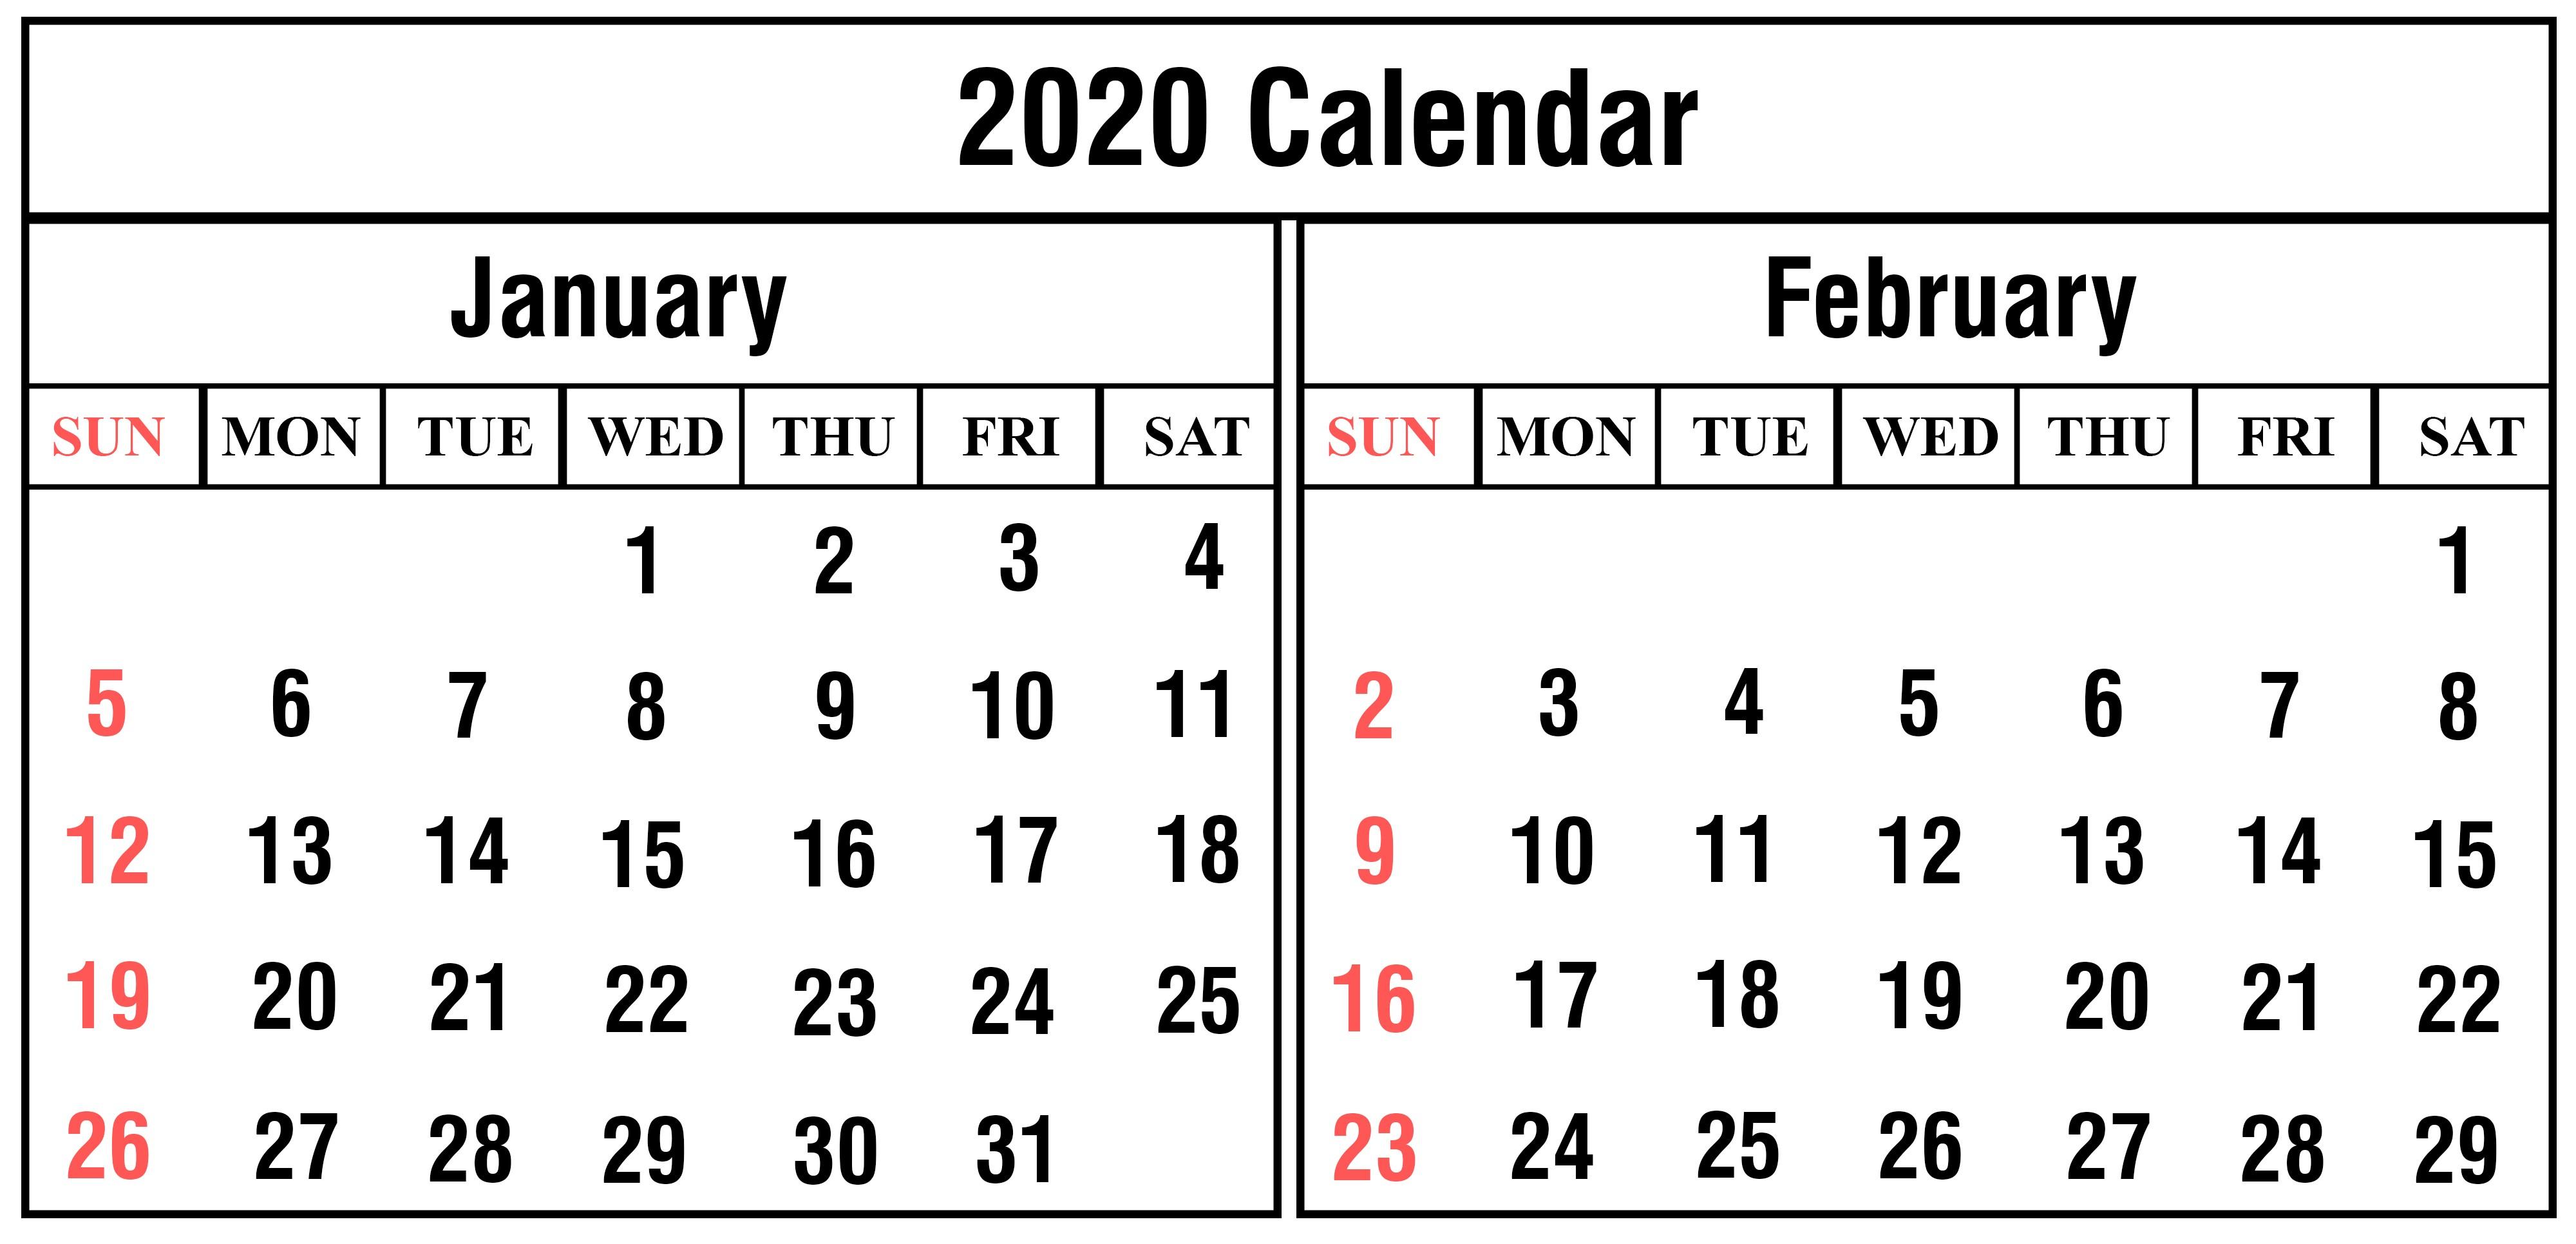 February 2020 Printable Calendar Printable Free January and February 2020 Calendar